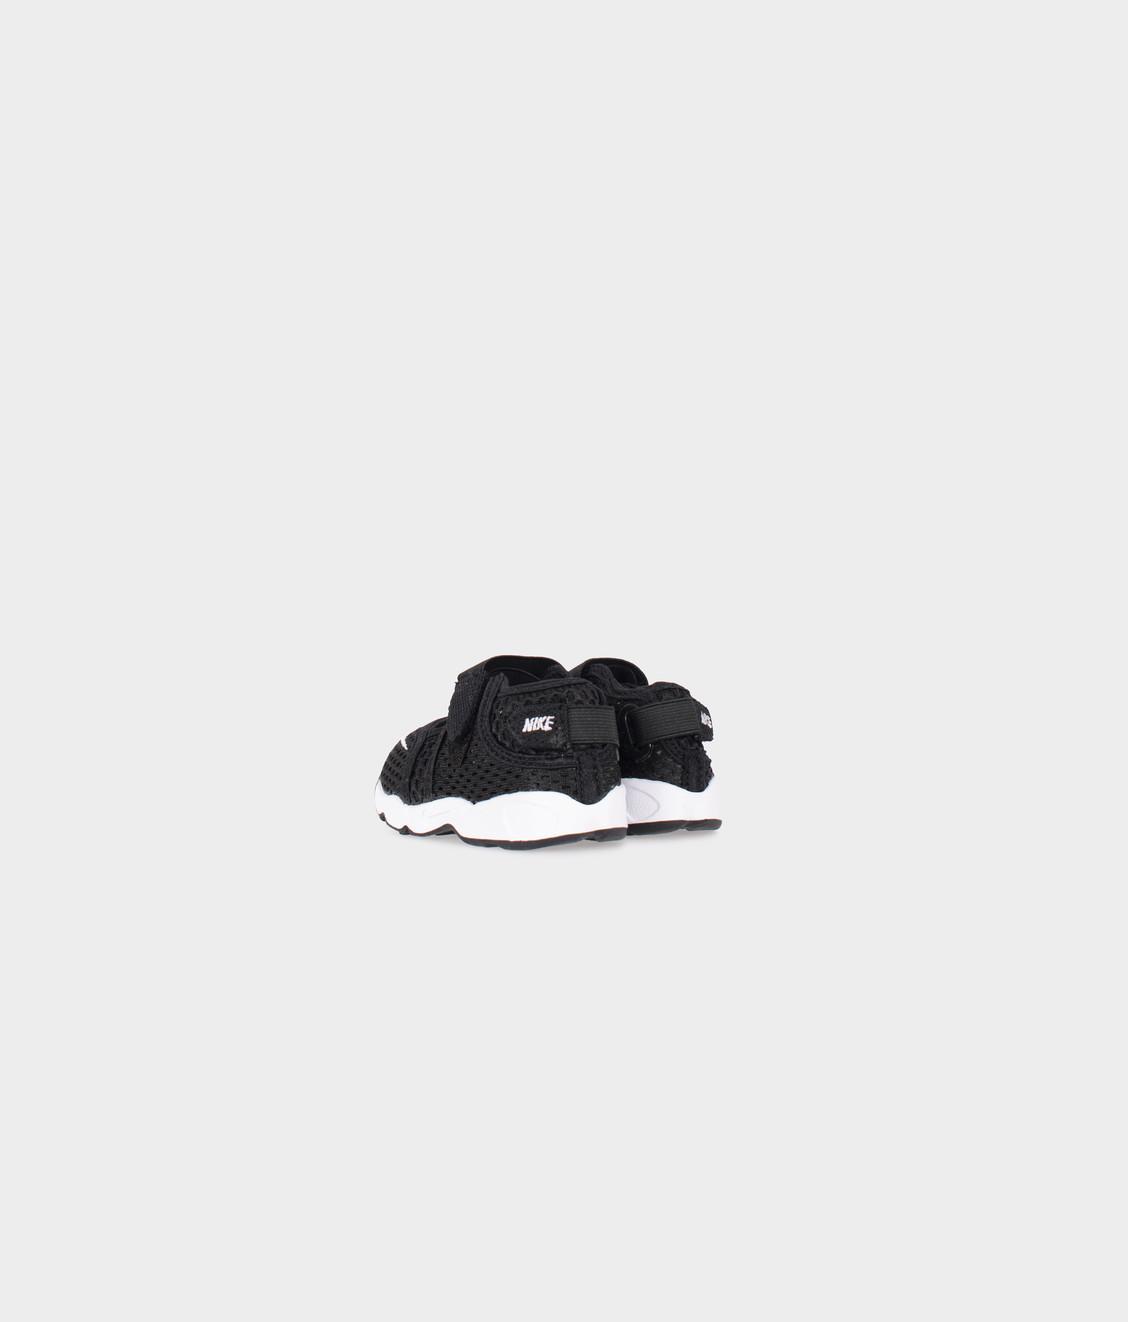 Nike Nike Rift (TD) Black